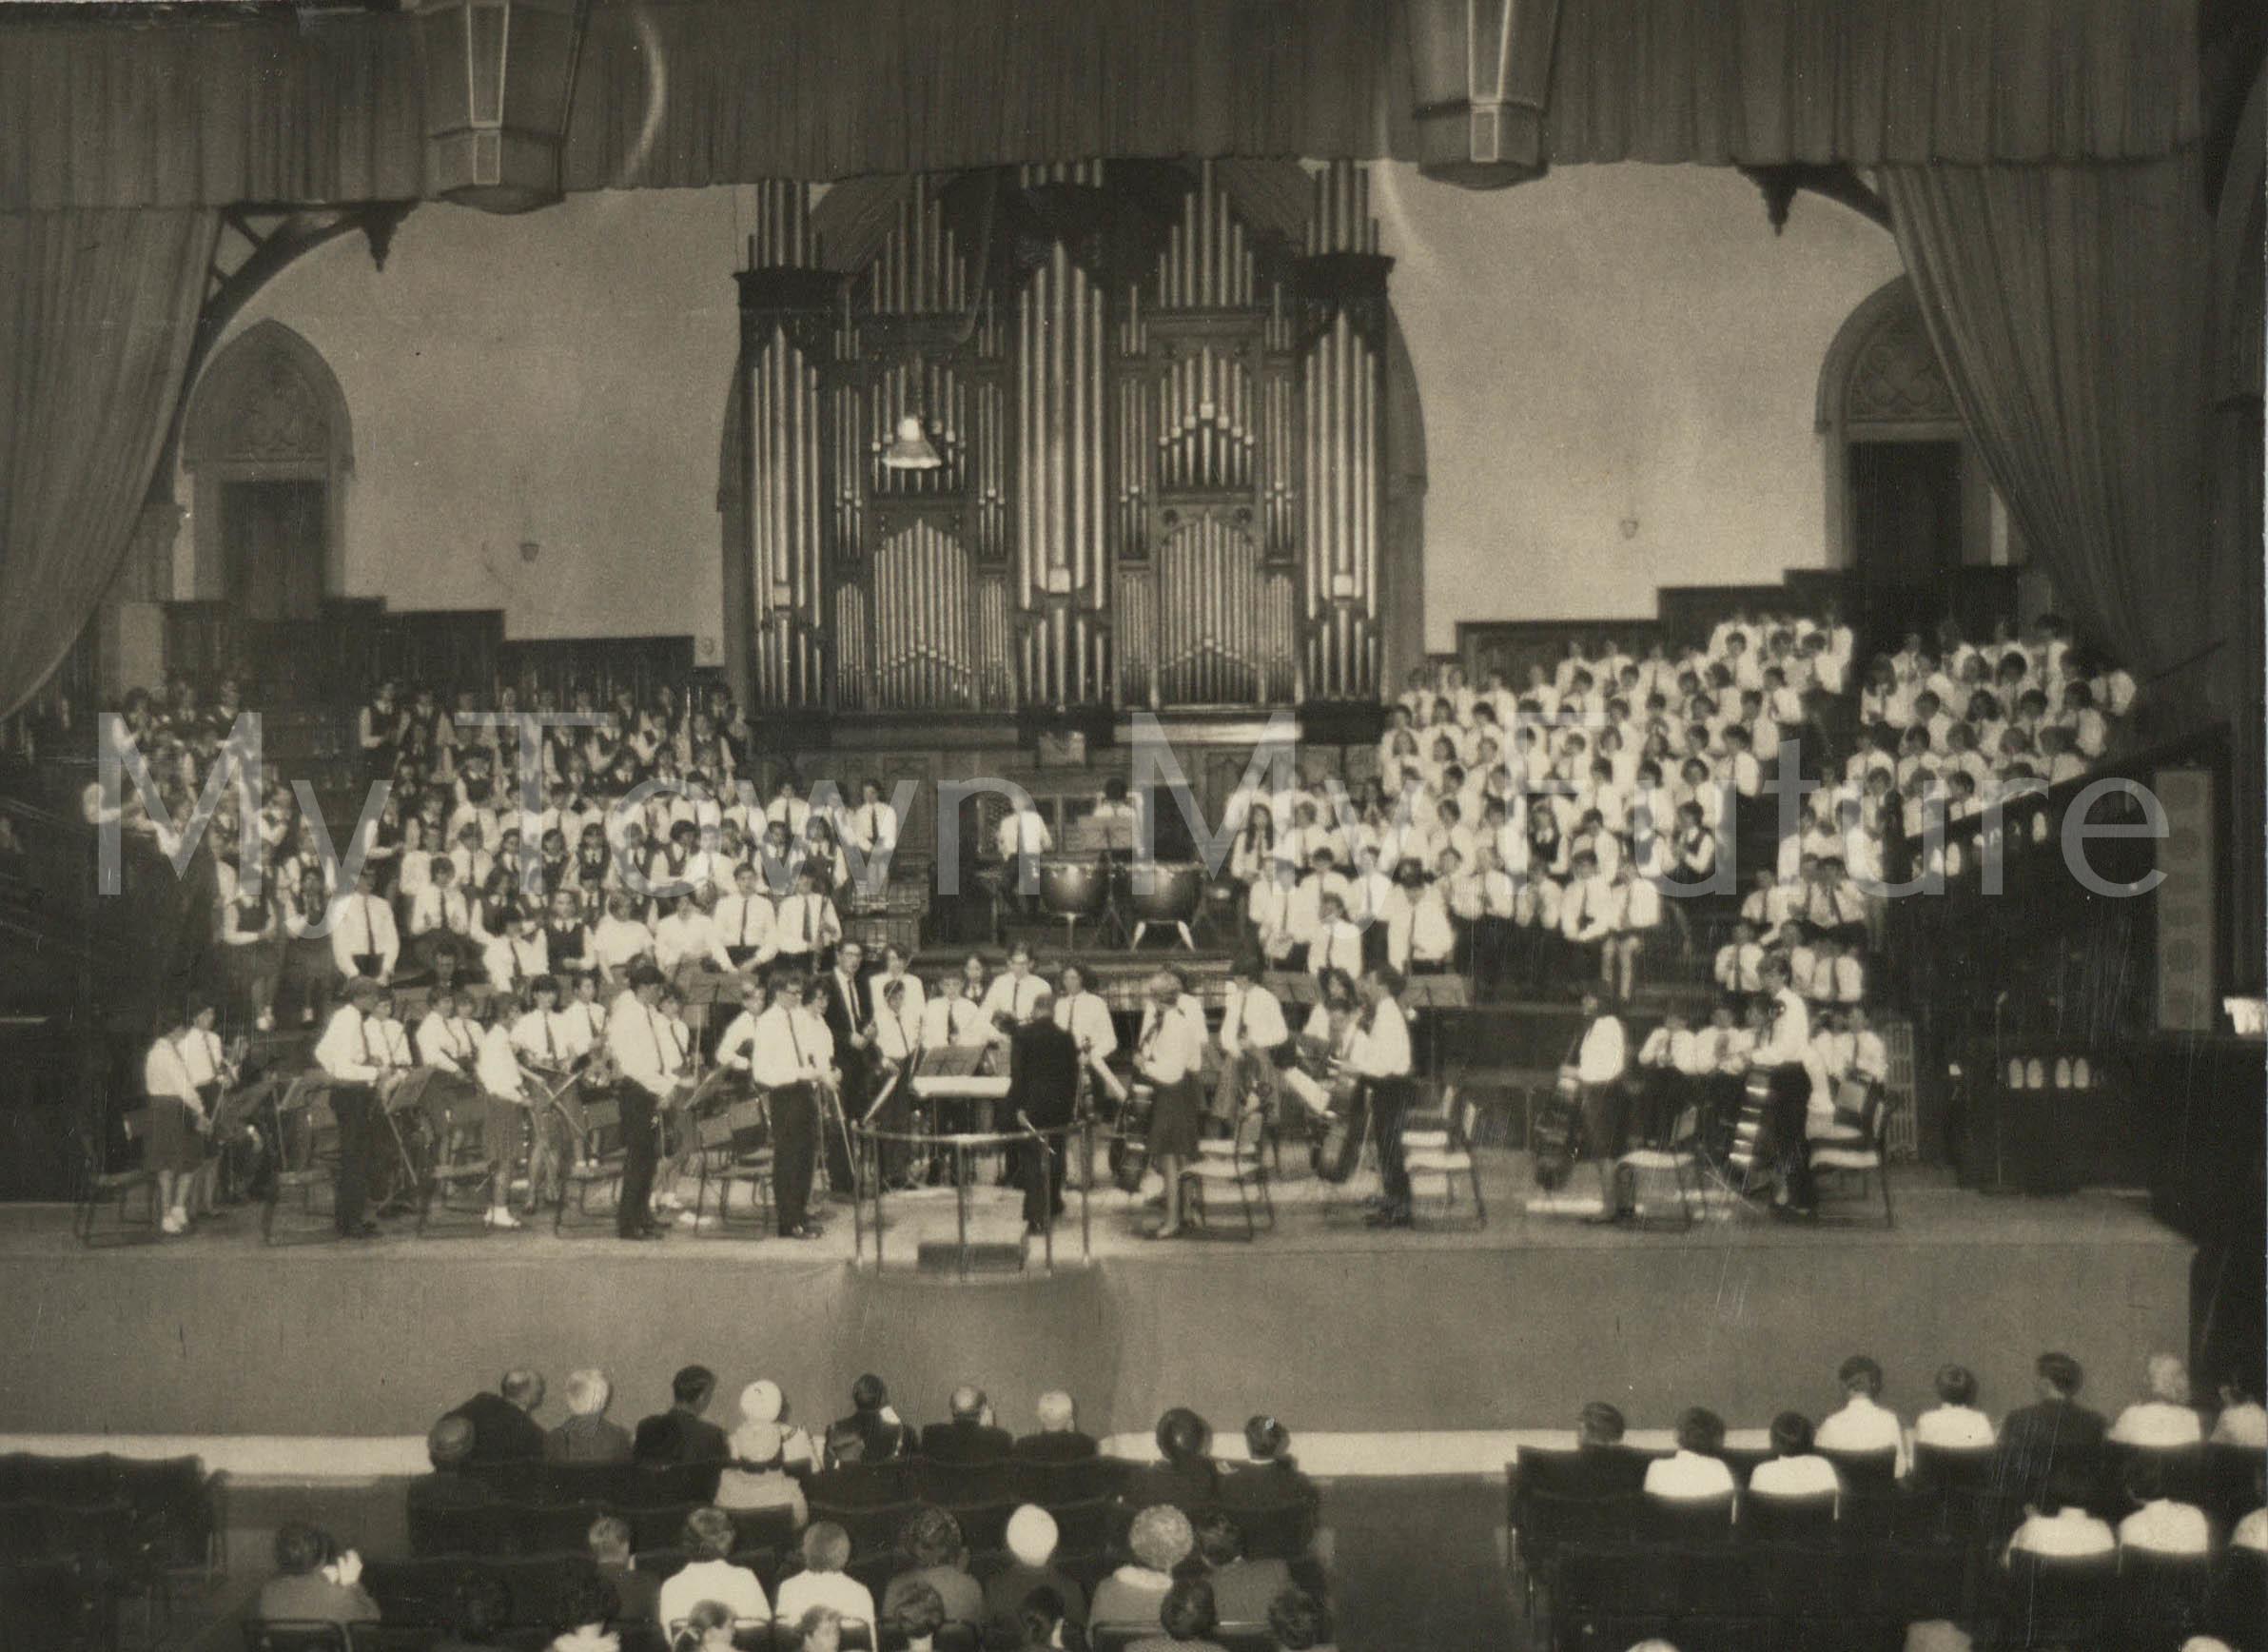 Middlesbrough Schools Choir & Orchestra 1966